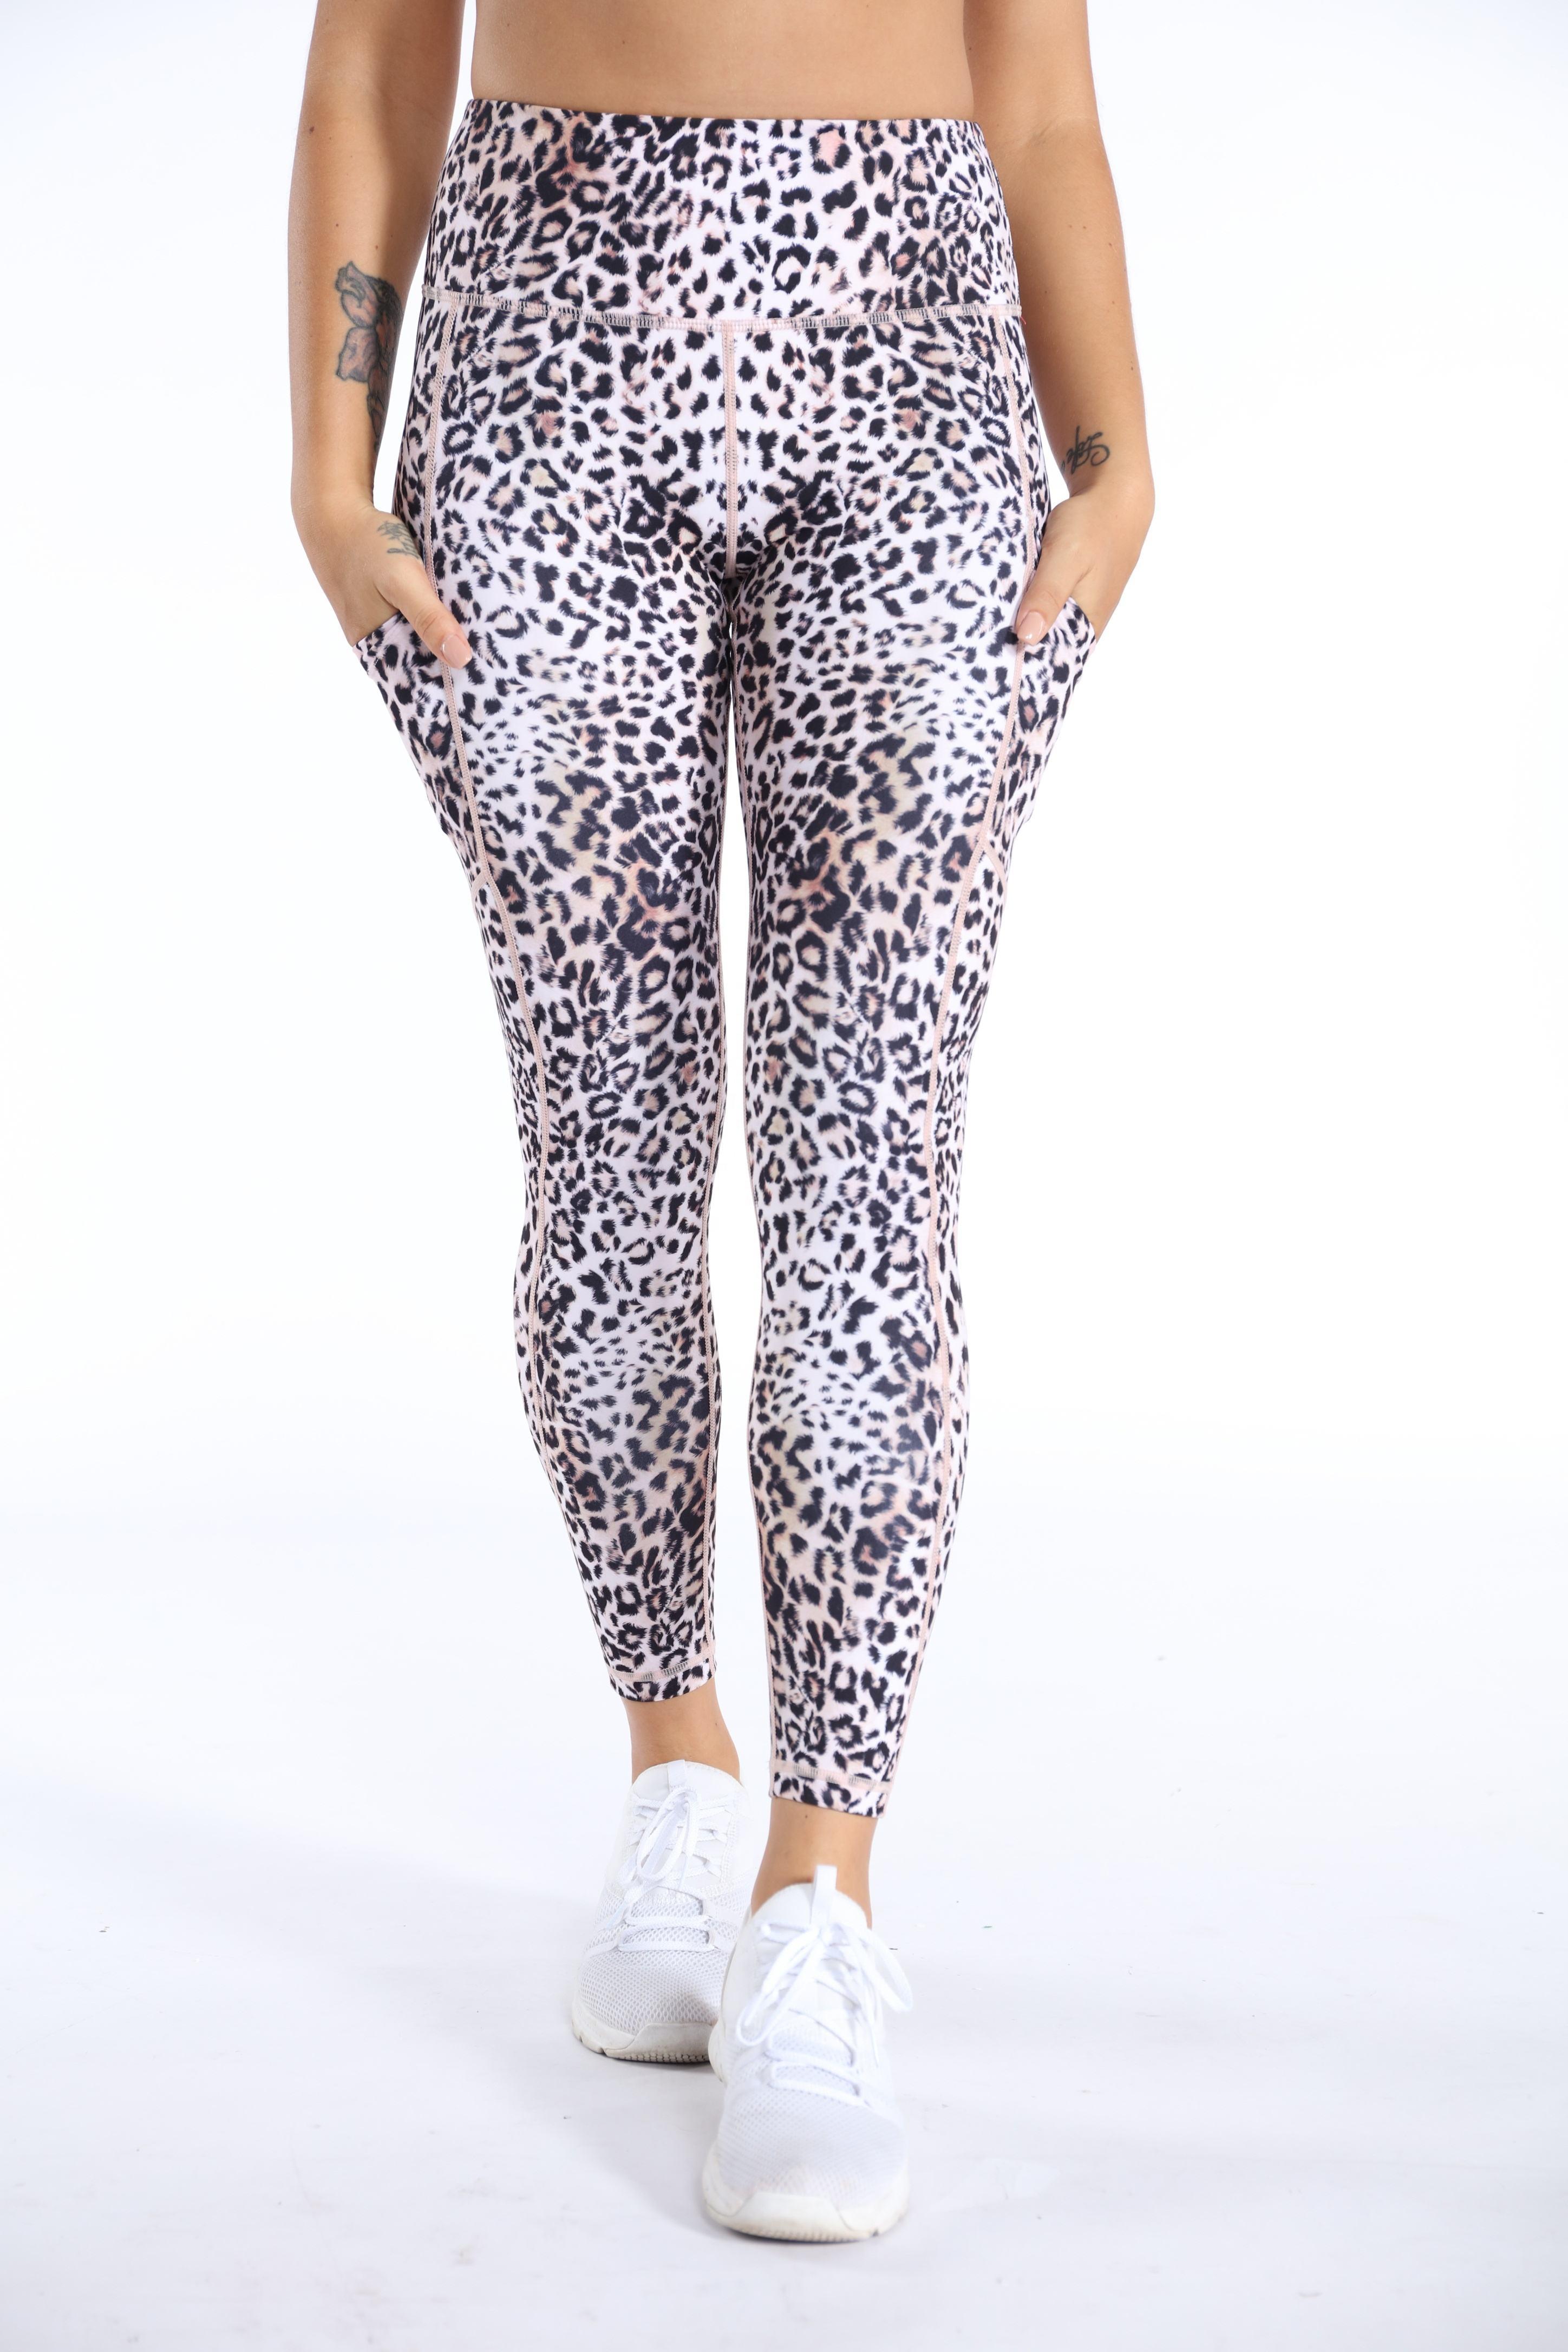 Womens Printed Leggings Hot Sale Yoga Pants Fashionable Women Activewear Ecofriendly Bamboo Animal Print Leggings